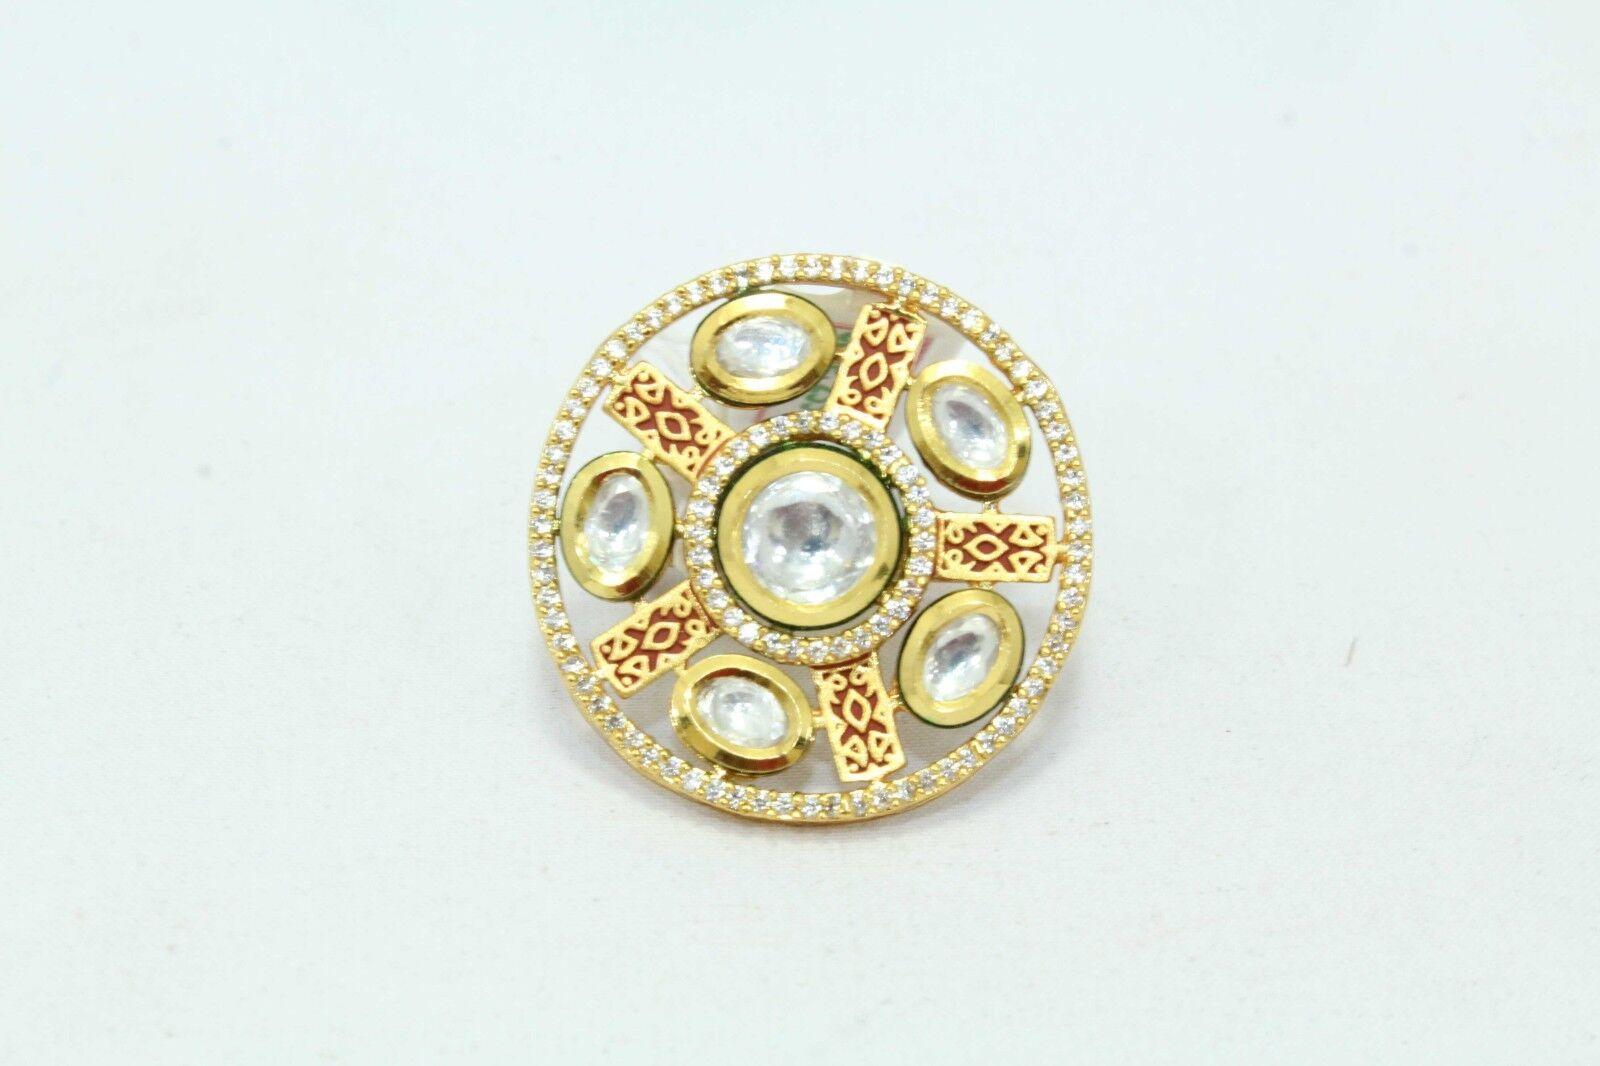 Fashion white Crystal Polki Bridal jadau women Ring gold Plated adjustable size